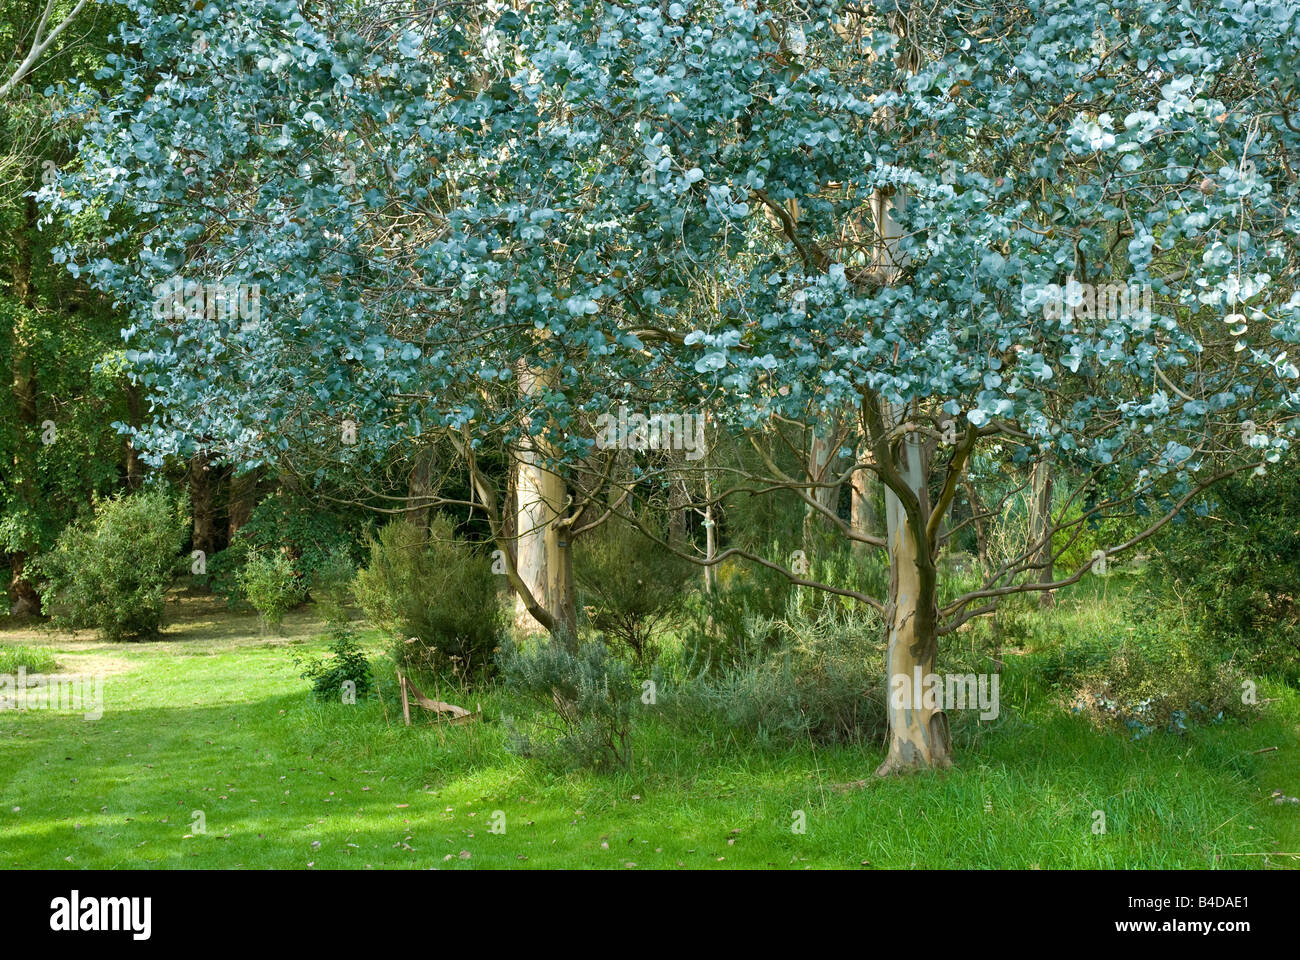 Eucalyptus Tree's blue leaves - Stock Image